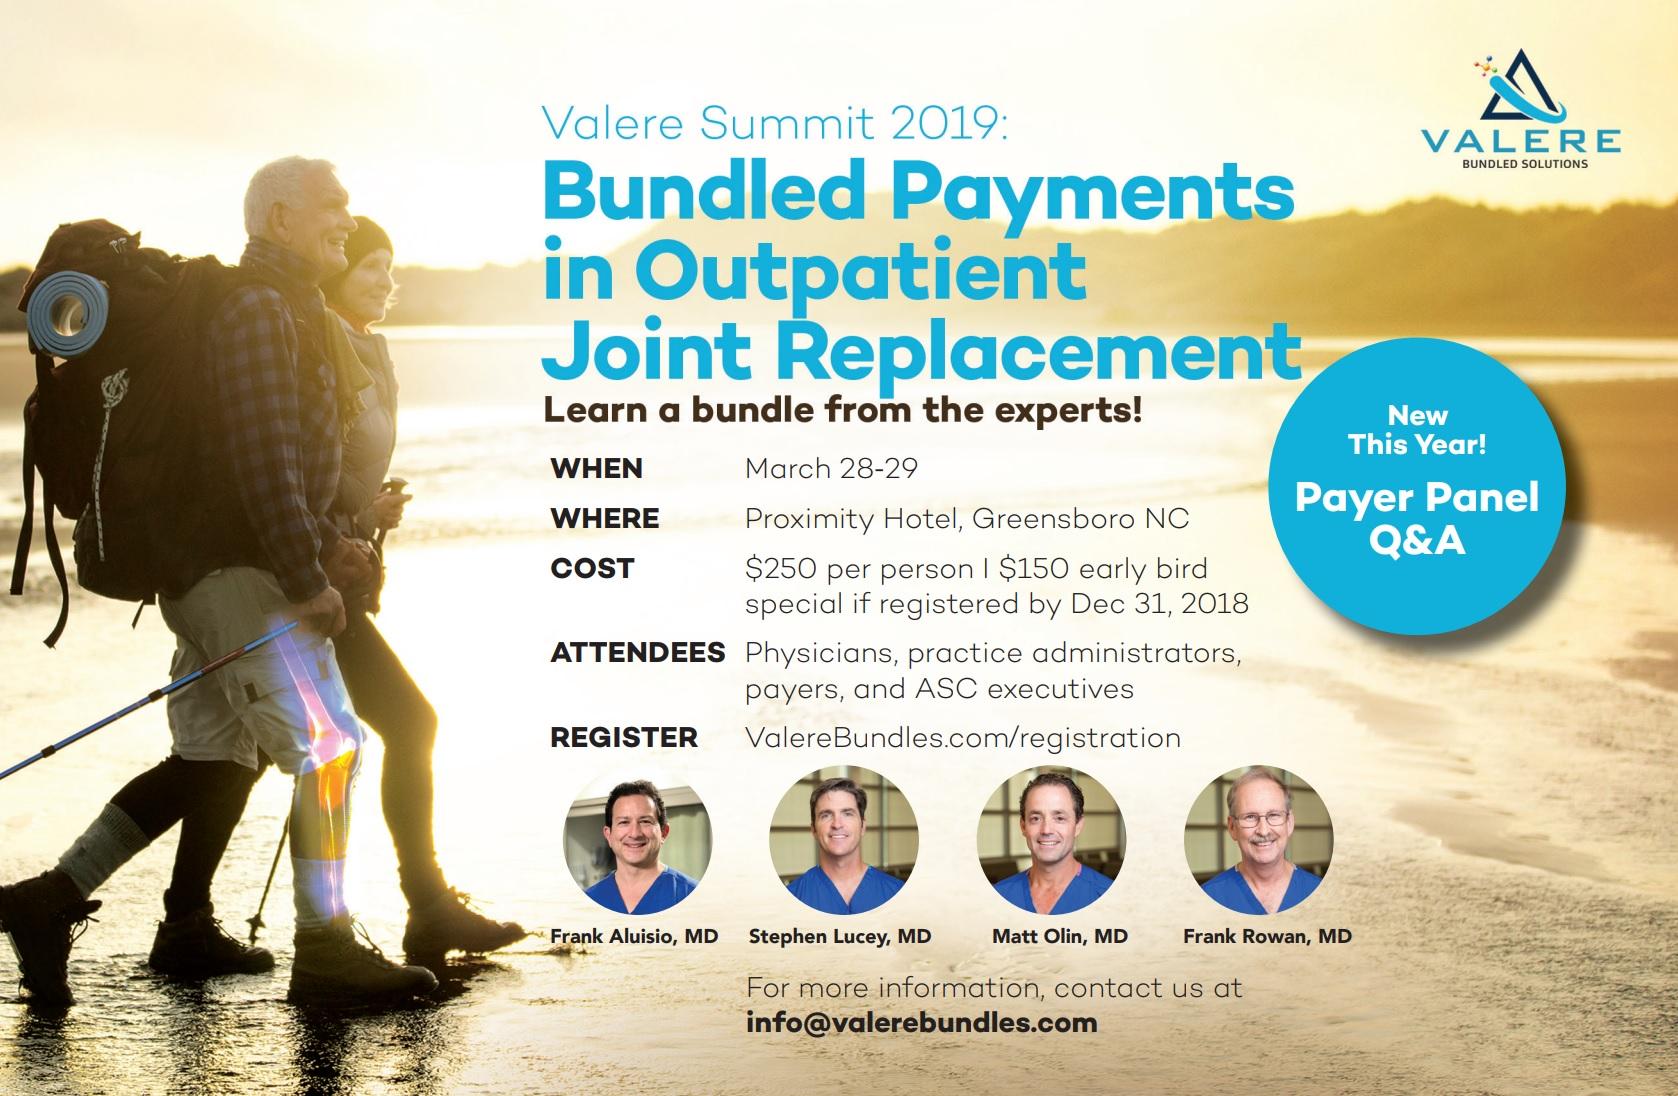 valere-summit-2019.jpg